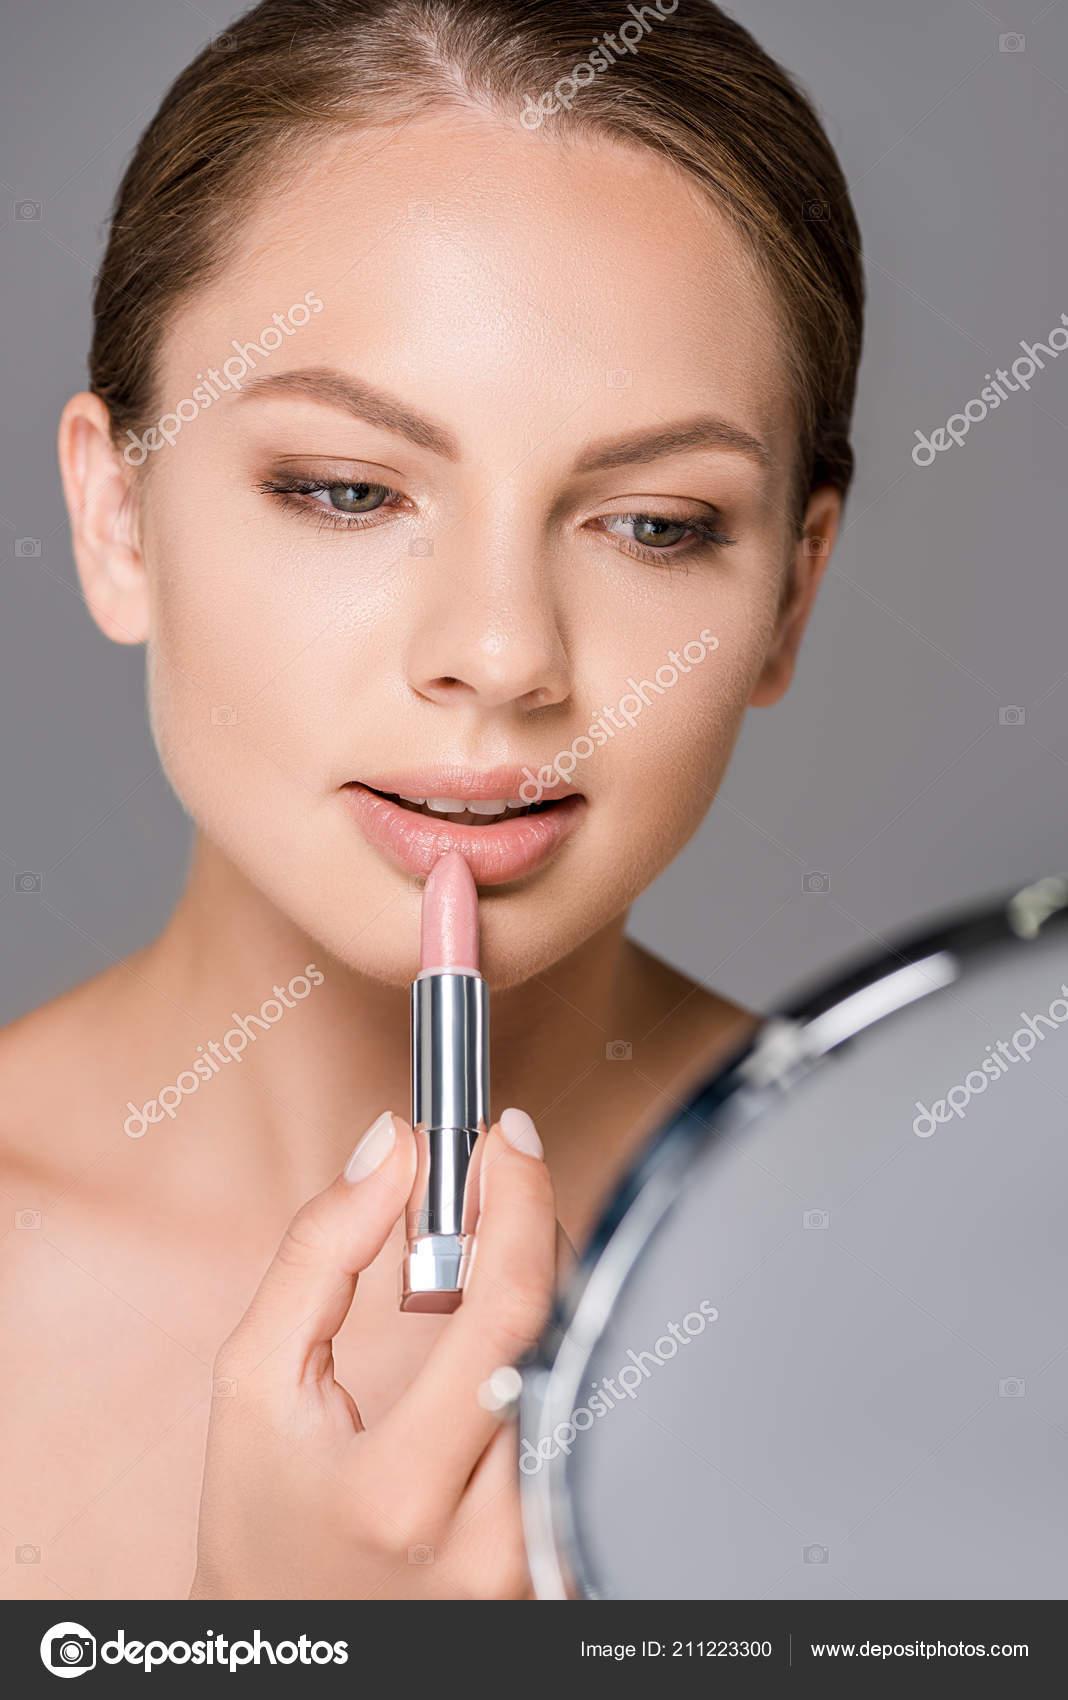 nude girl putting on lipstick